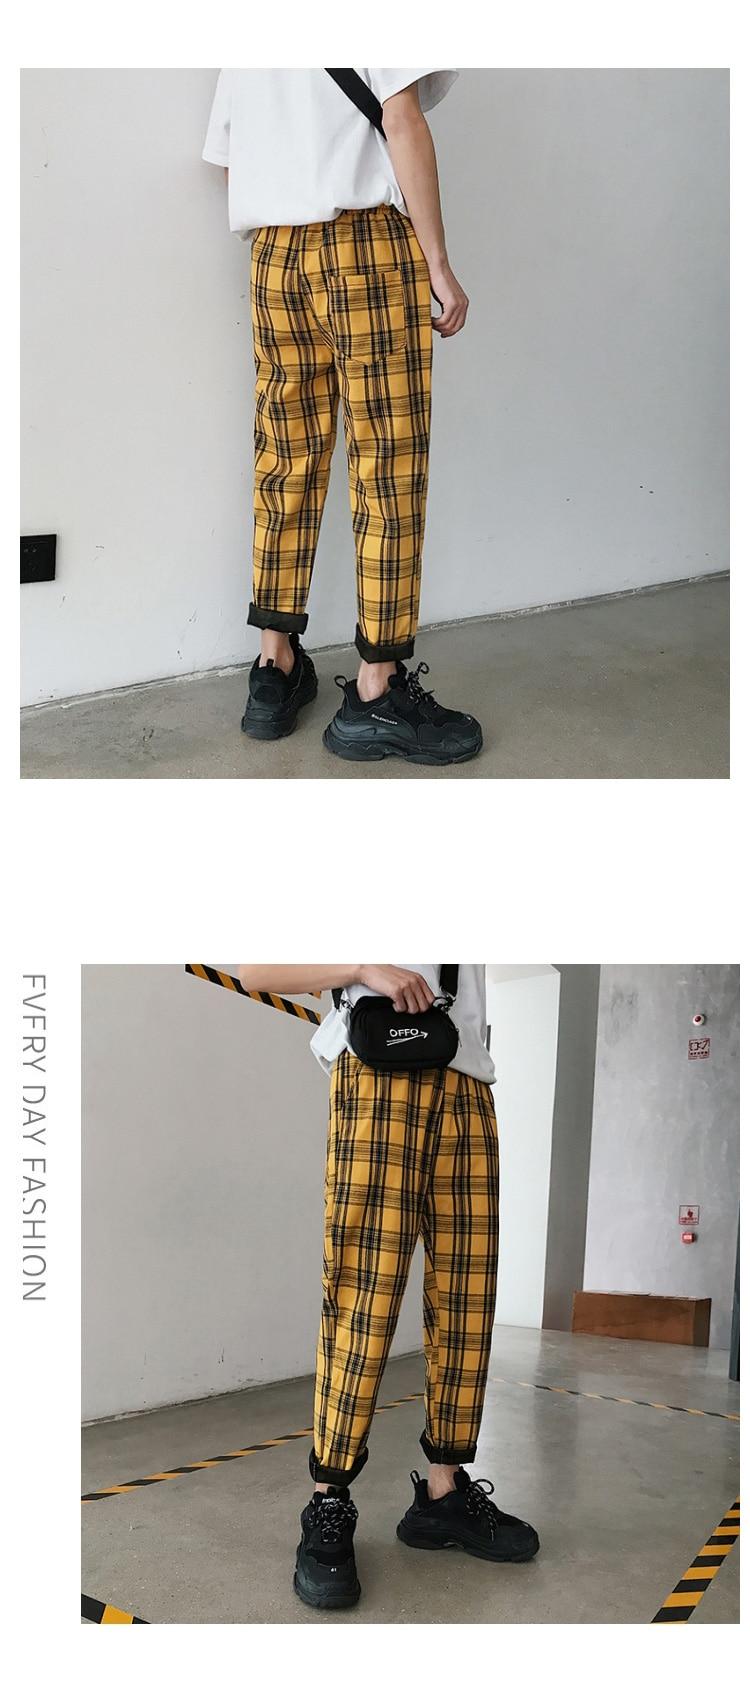 LAPPSTER Streetwear Yellow Plaid Pants Men Joggers 19 Man Casual Straight Harem Pants Men Korean Hip Hop Track Pants Plus Size 4